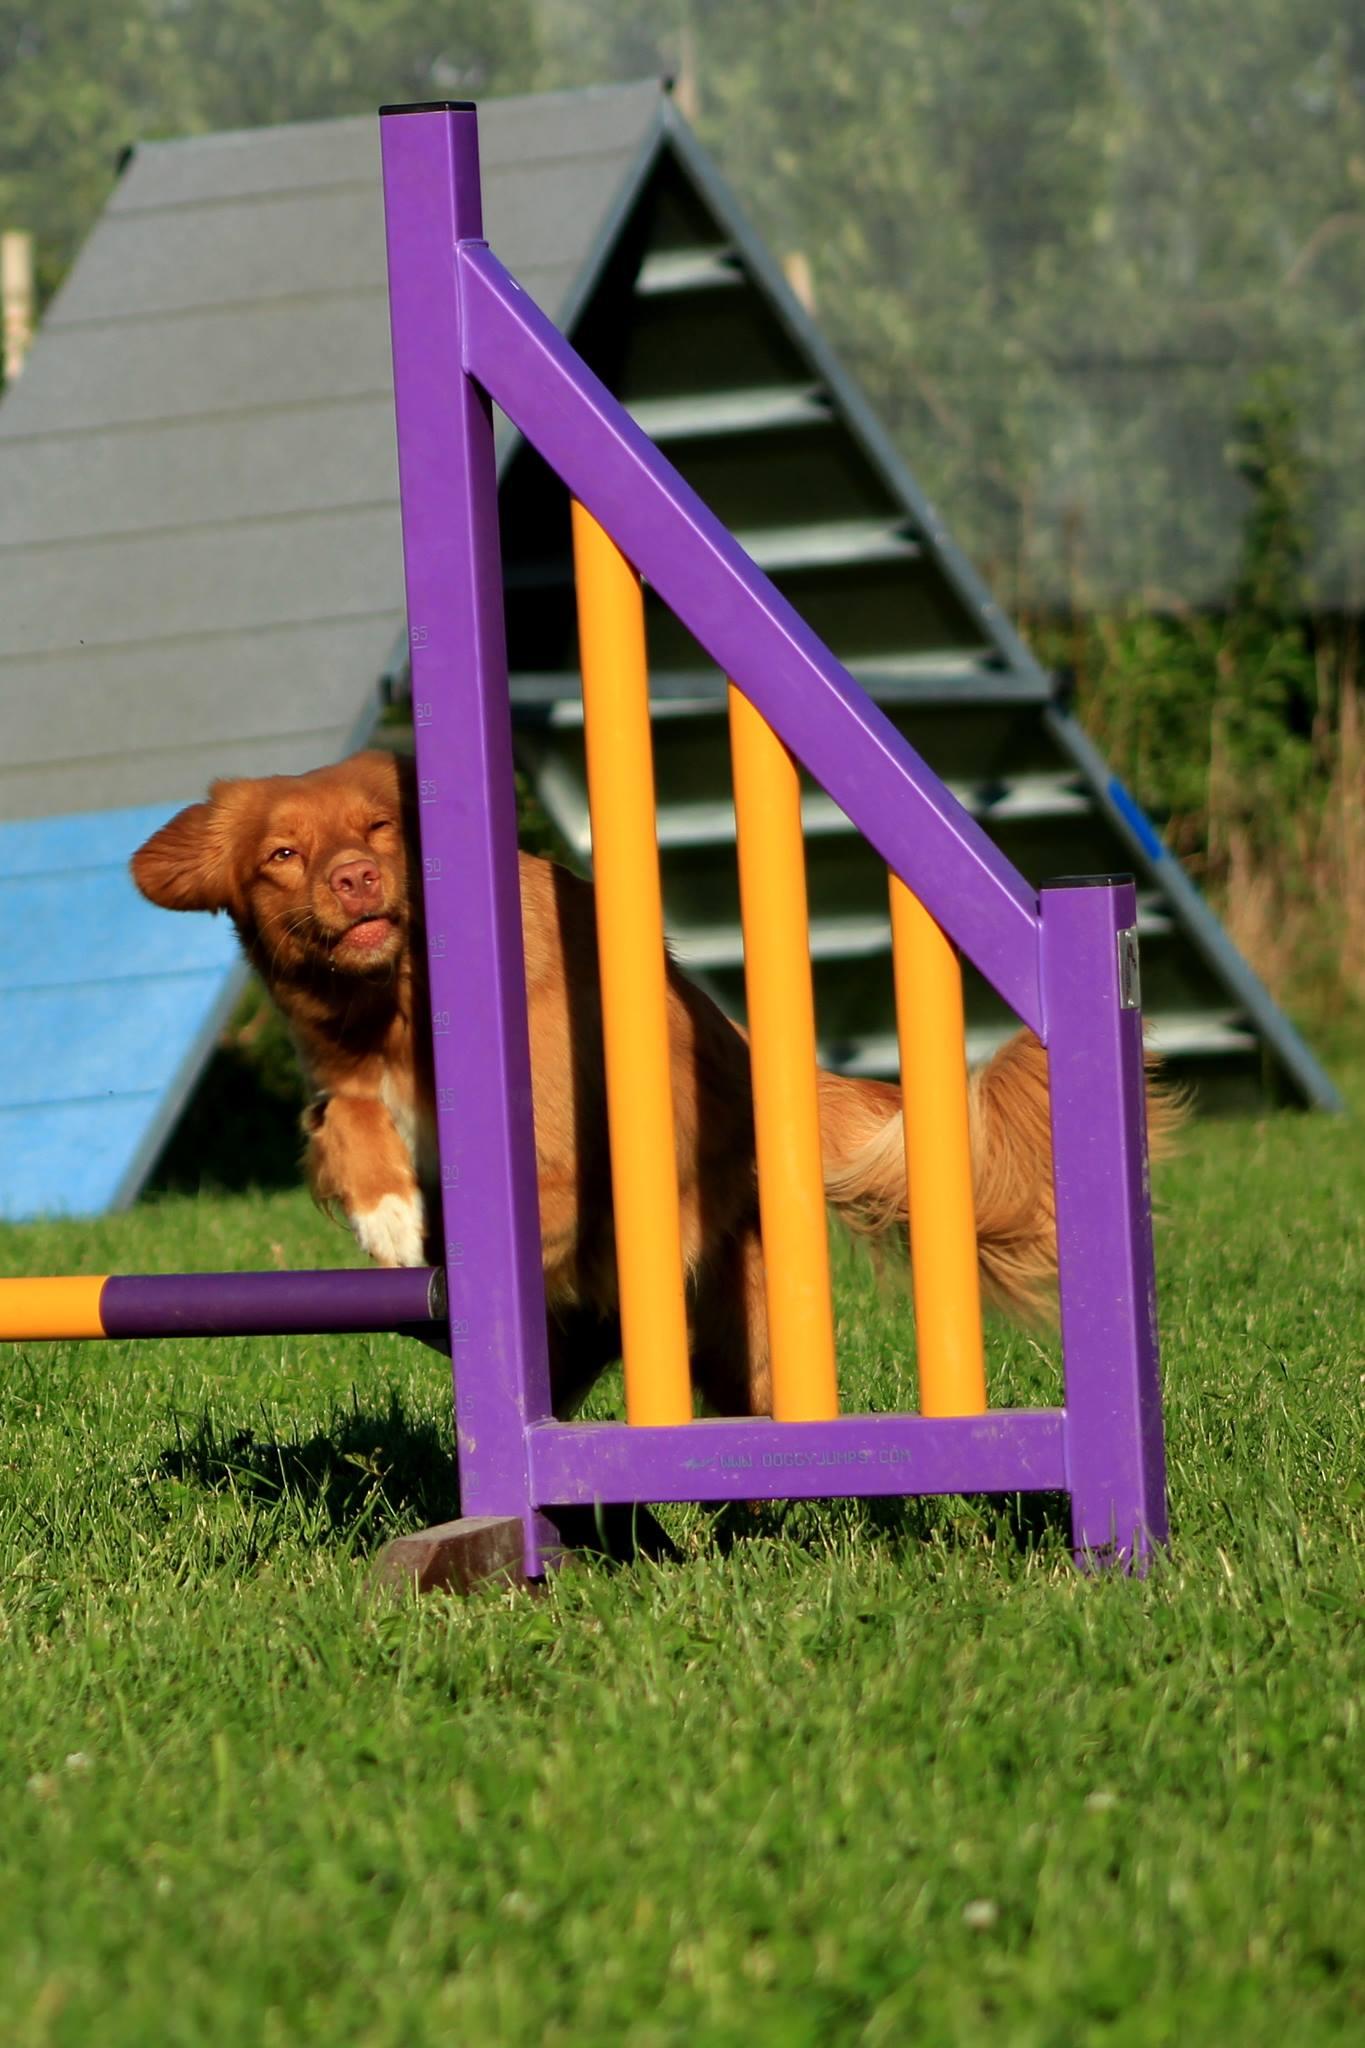 muzo-chien-lyon-agility-miette-saut-tic-tac.jpg